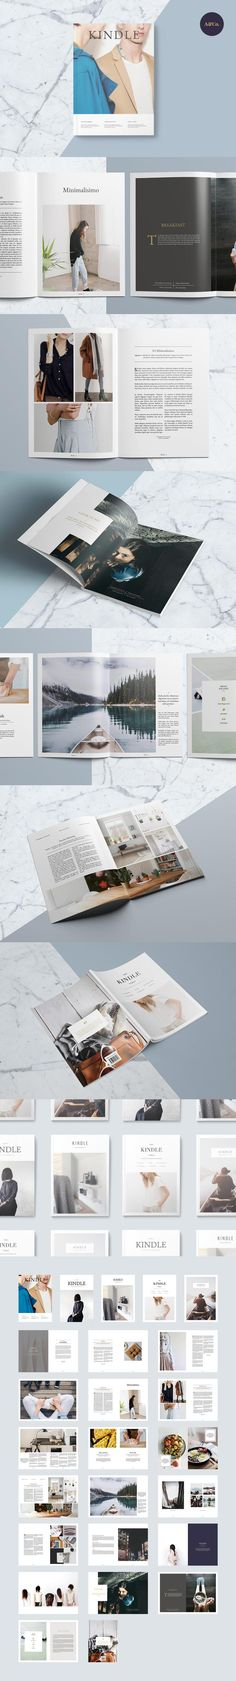 #magazine #design from Ally & Co. | DOWNLOAD: https://creativemarket.com/allyandco/654388-Kindle-Magazine?u=zsoltczigler